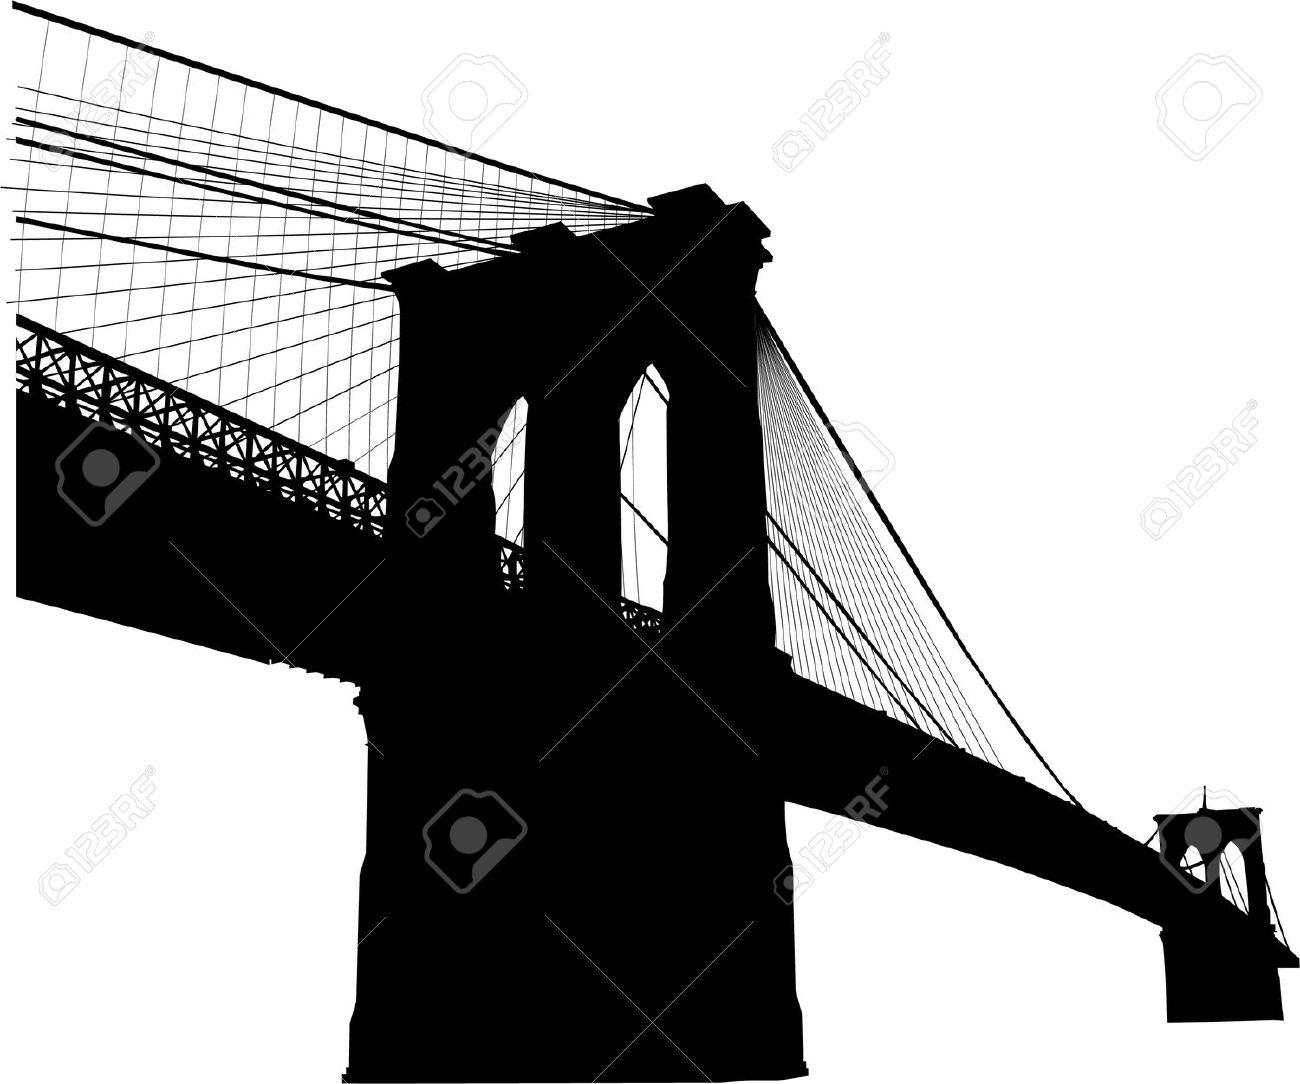 454 Brooklyn Bridge Cliparts, Stock Vector And Royalty Free.